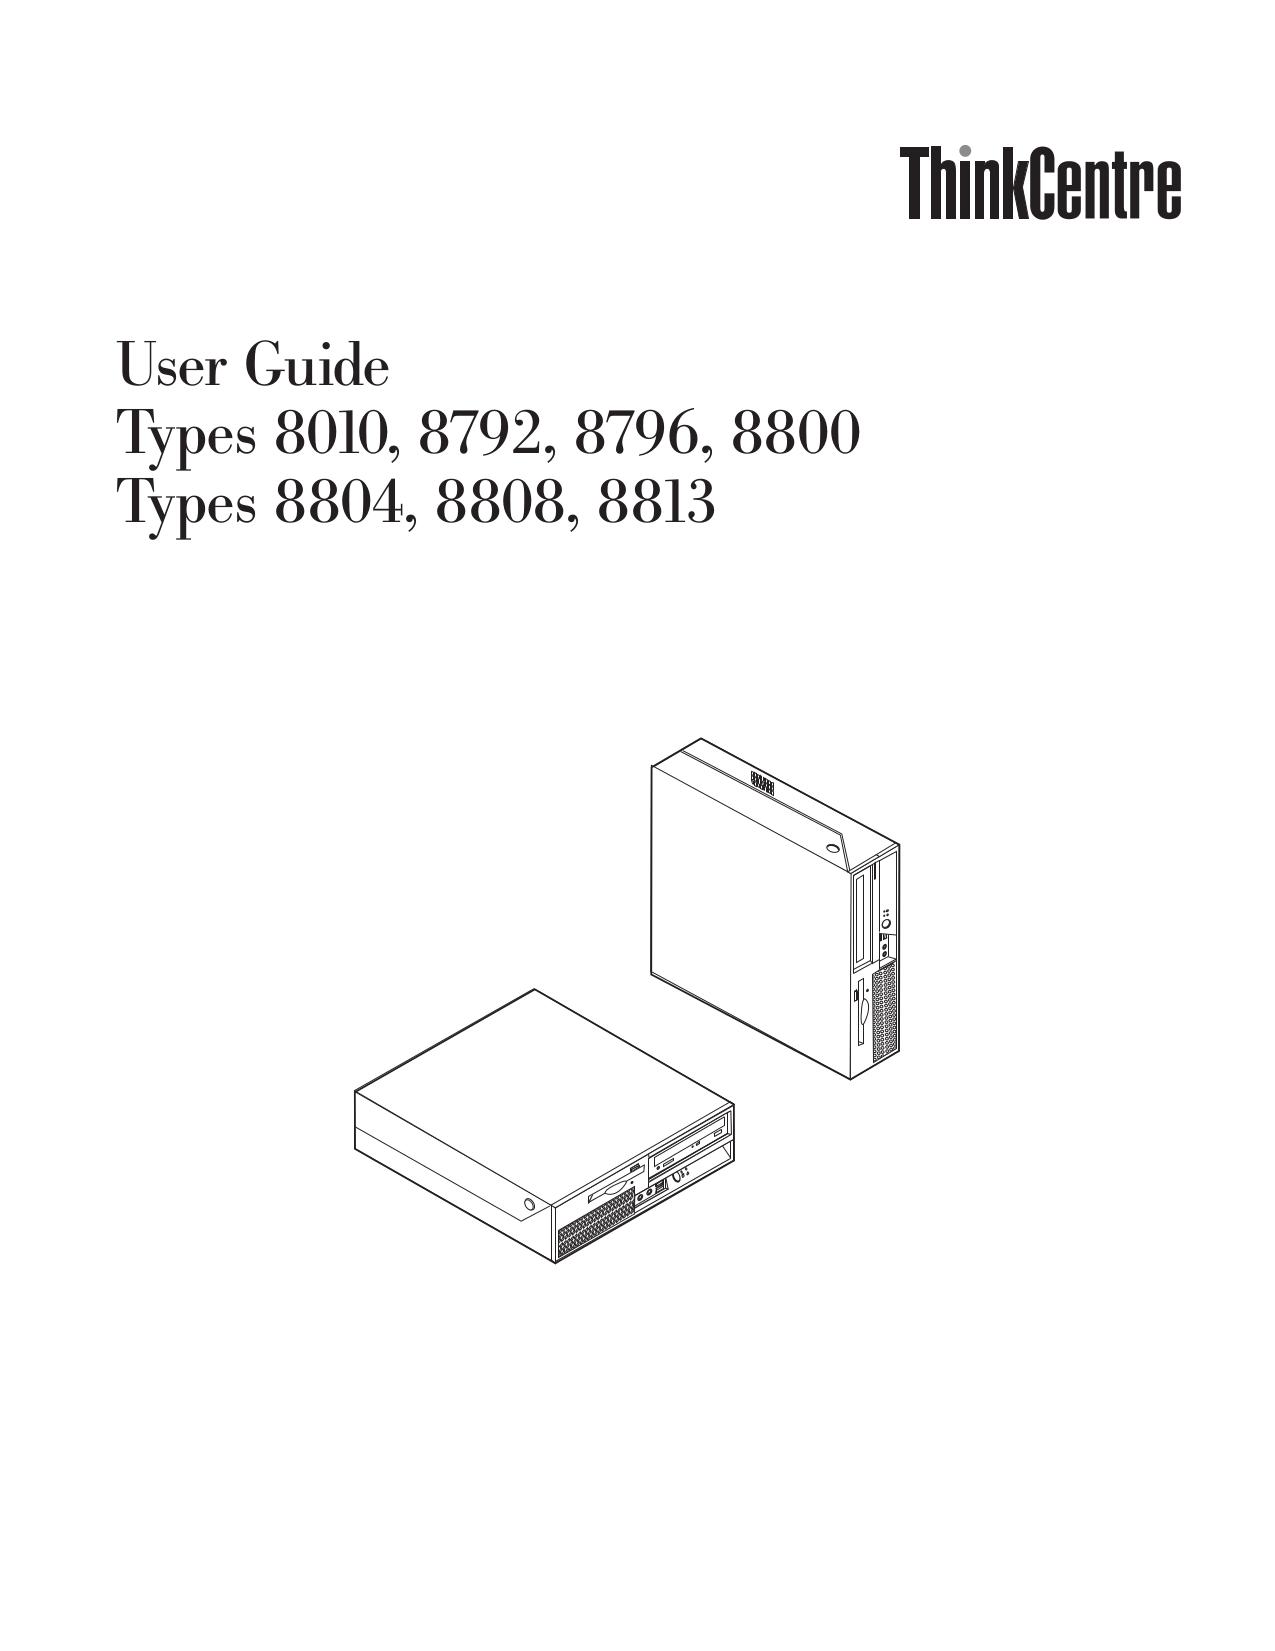 pdf for Lenovo Desktop ThinkCentre M55p 8813 manual